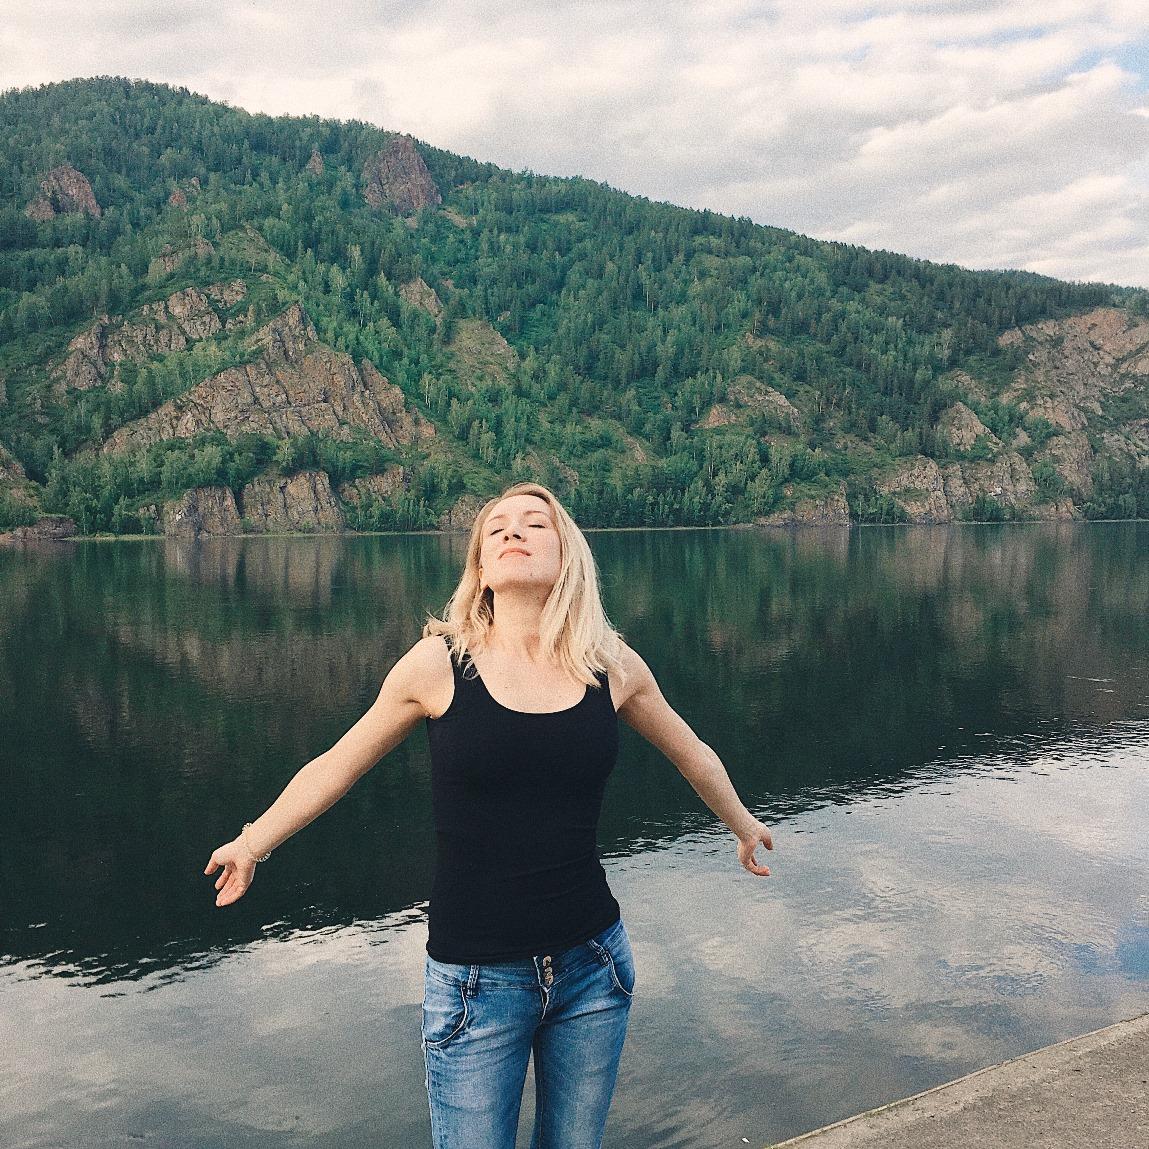 Девушка у реки